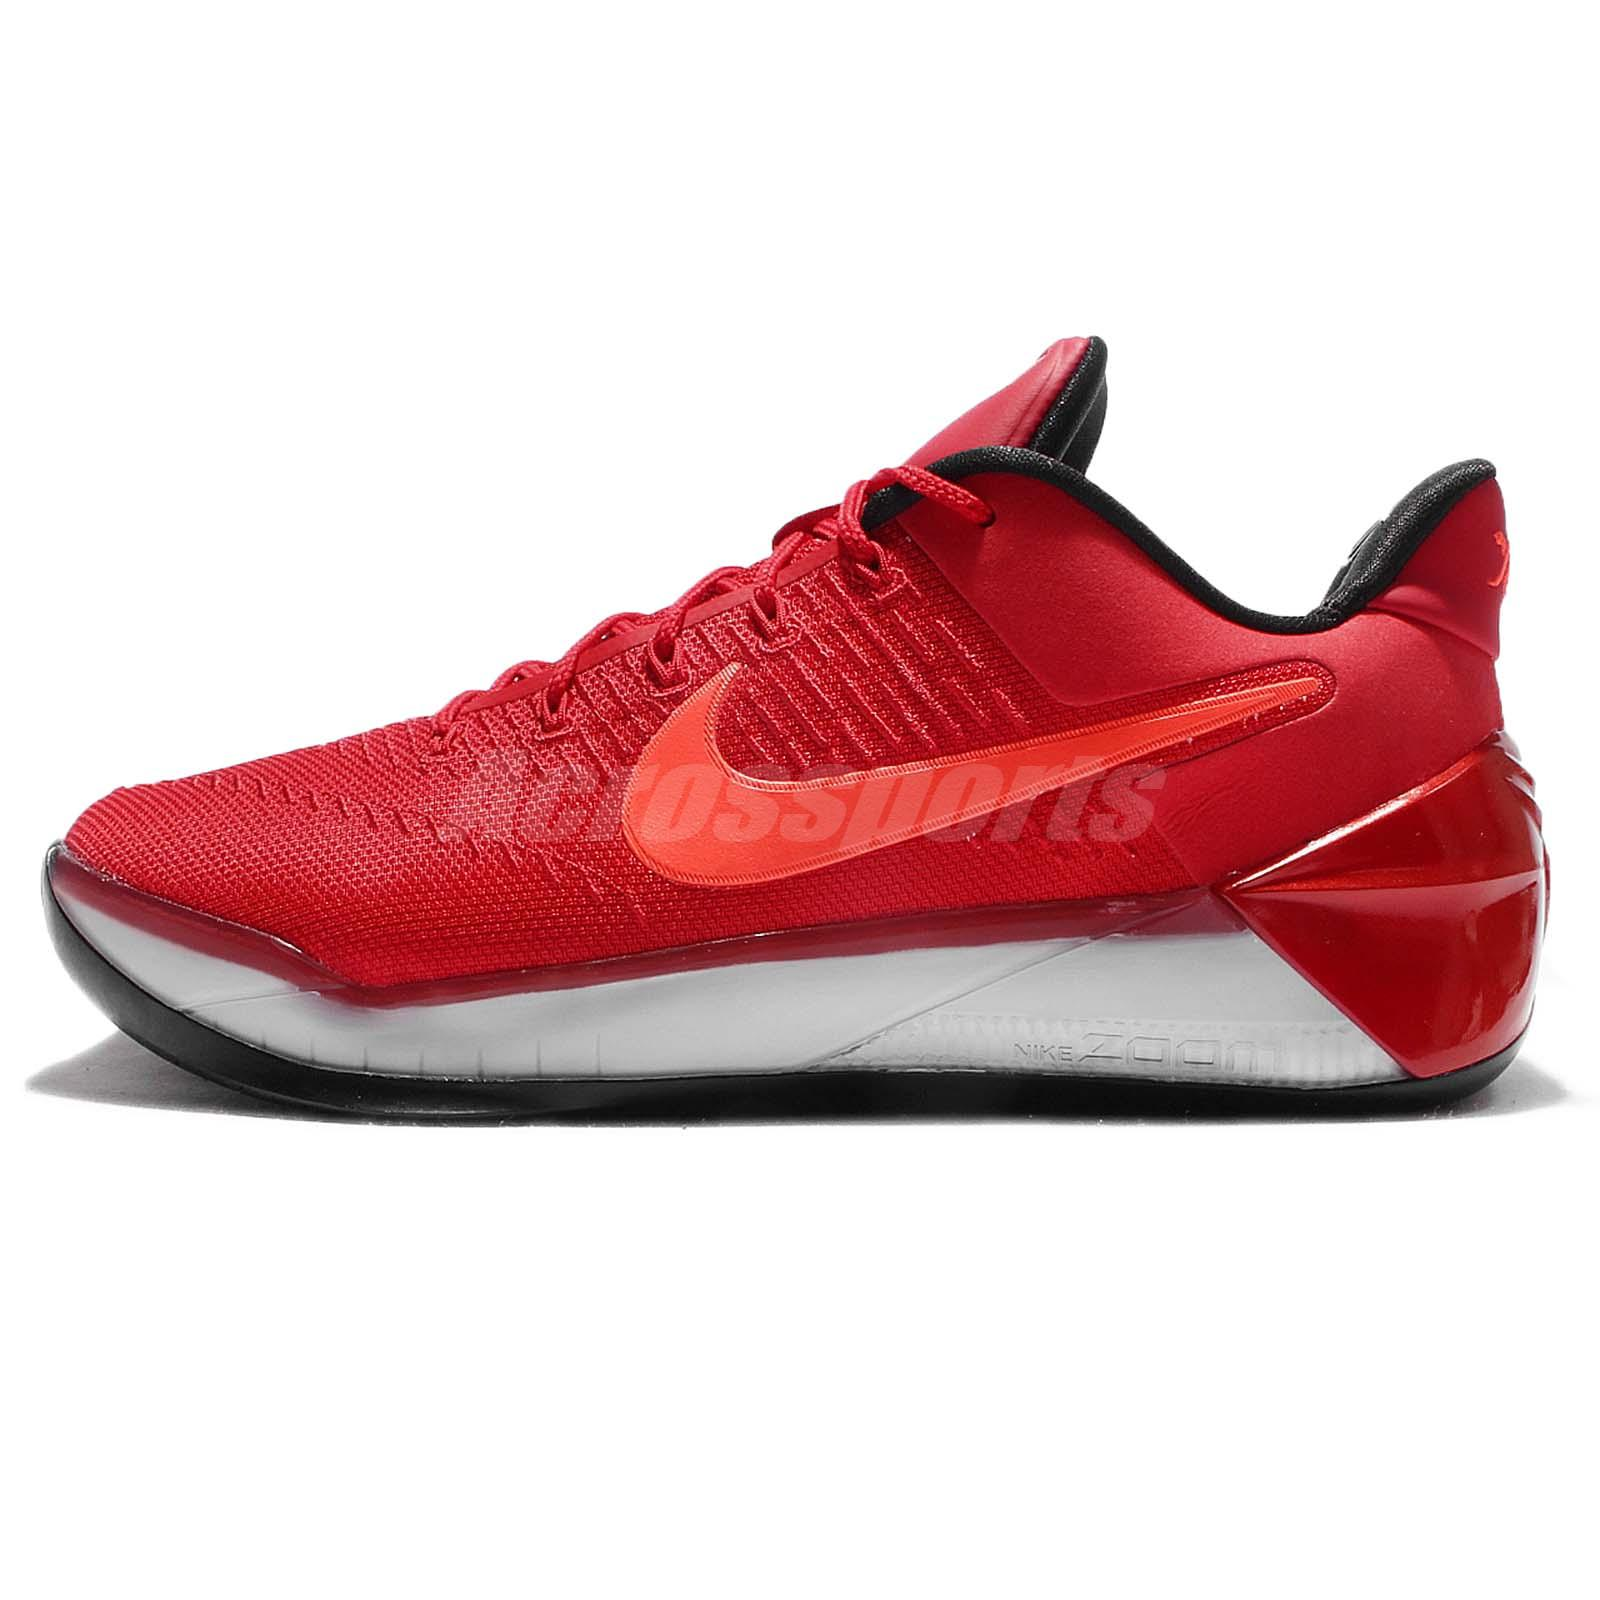 Nike Kobe A.D. EP Bryant XII 12 University Red Men Basketball Shoes  852427-608